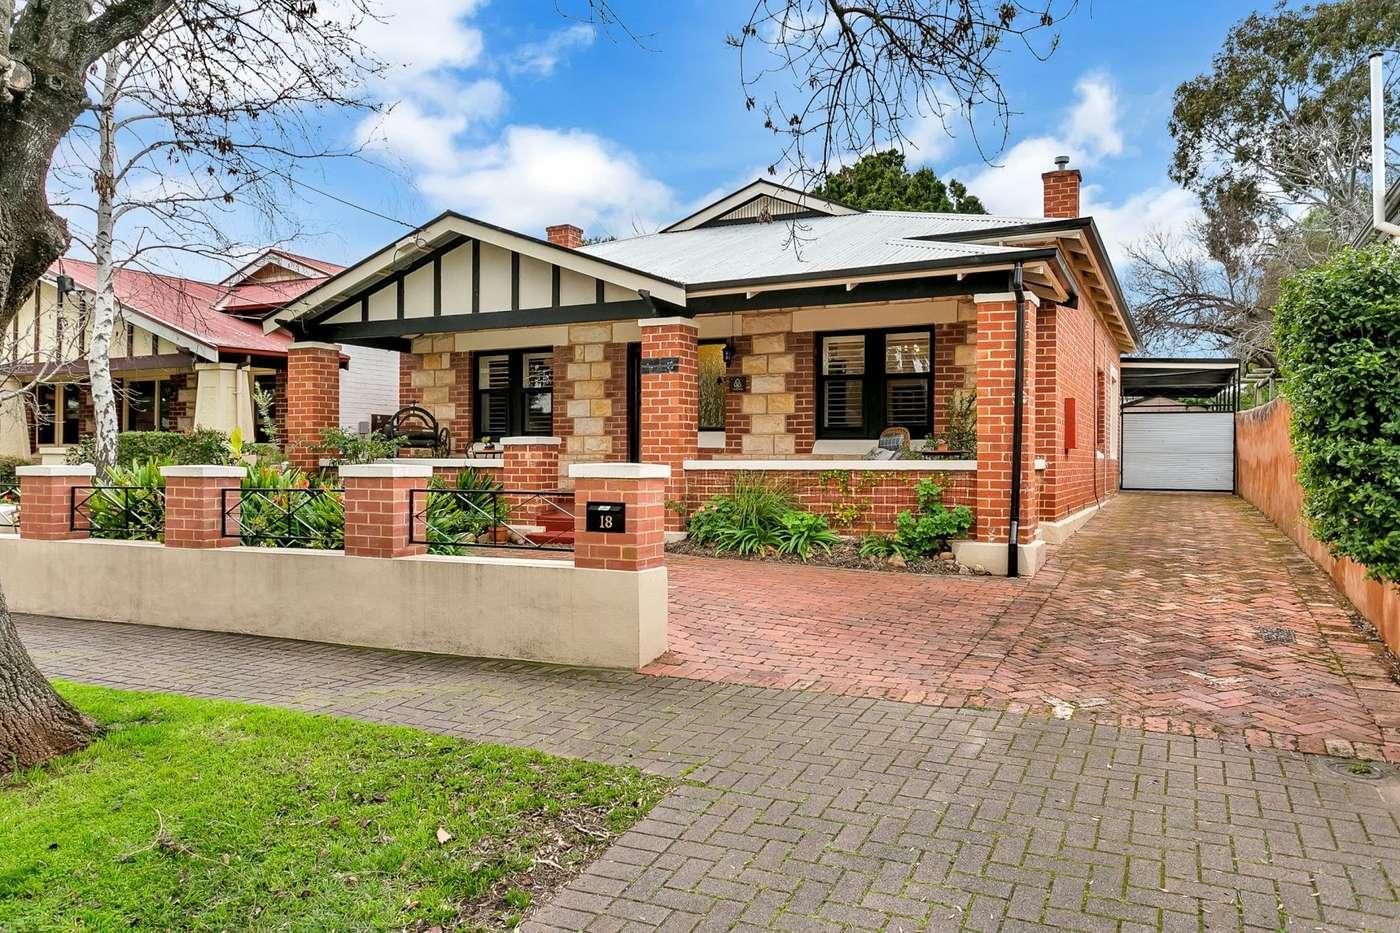 Main view of Homely house listing, 18 Howard Terrace, Hazelwood Park, SA 5066